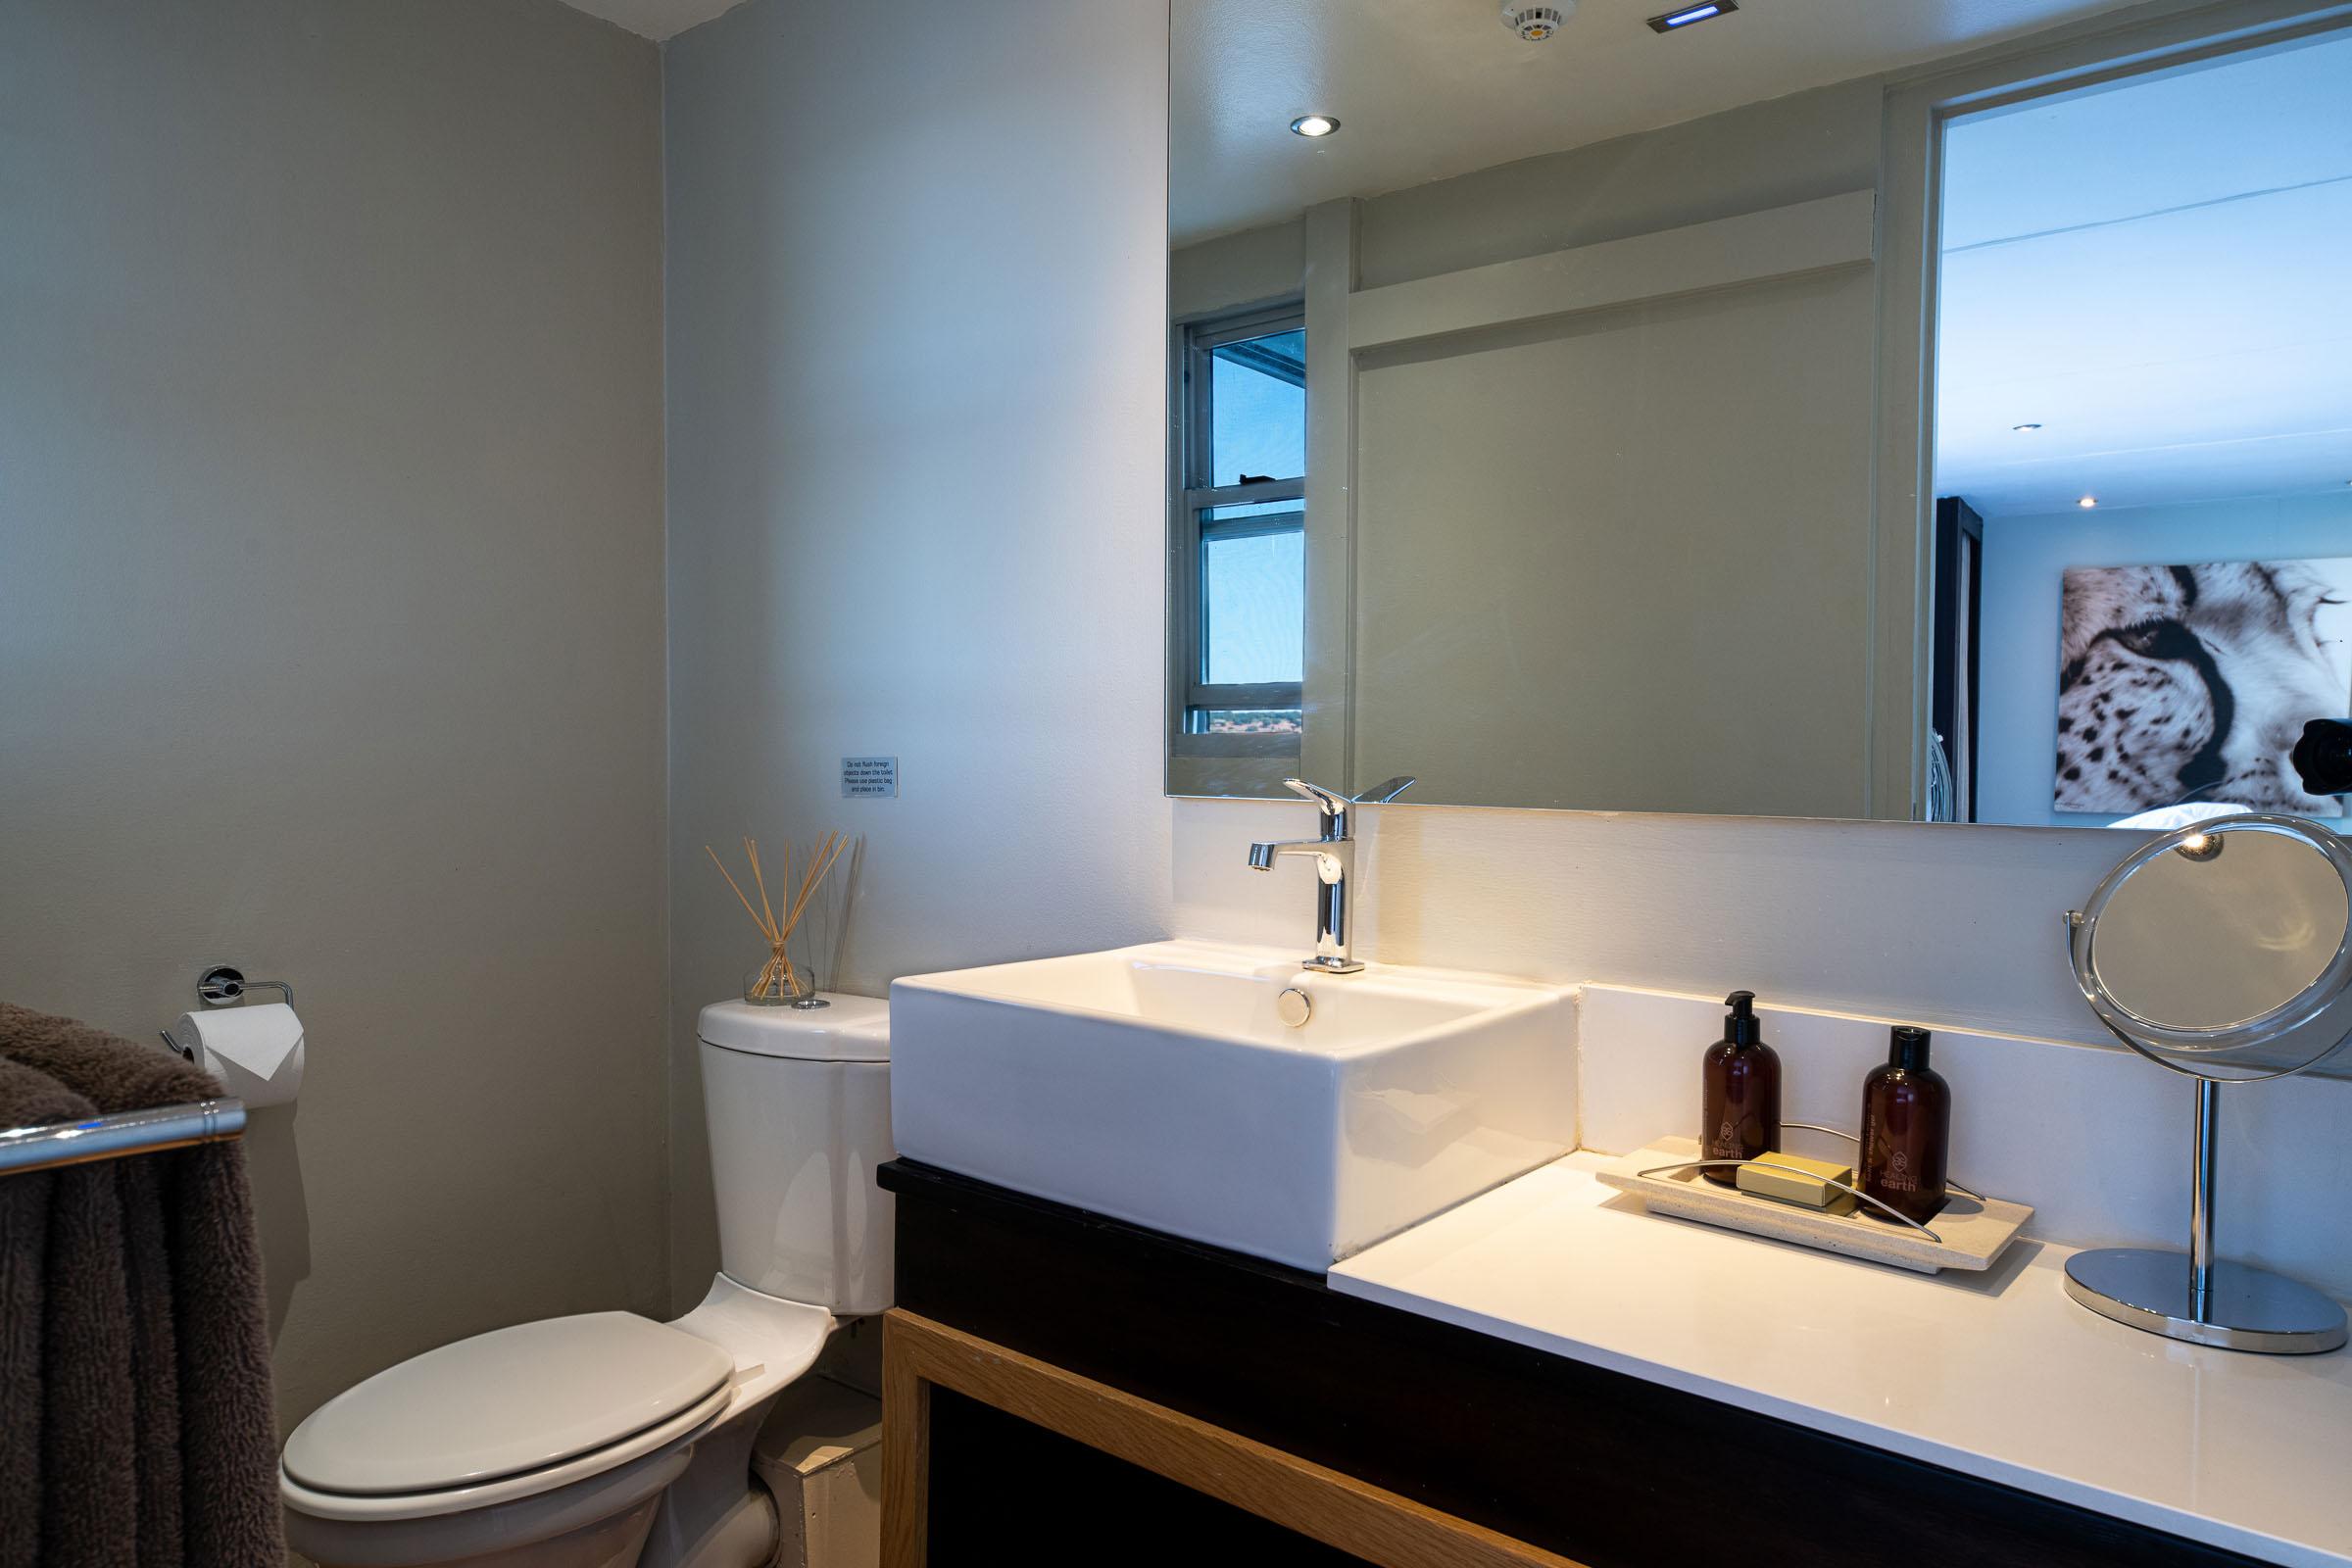 Accommodation - Standard Suite Bathroom 1.JPG